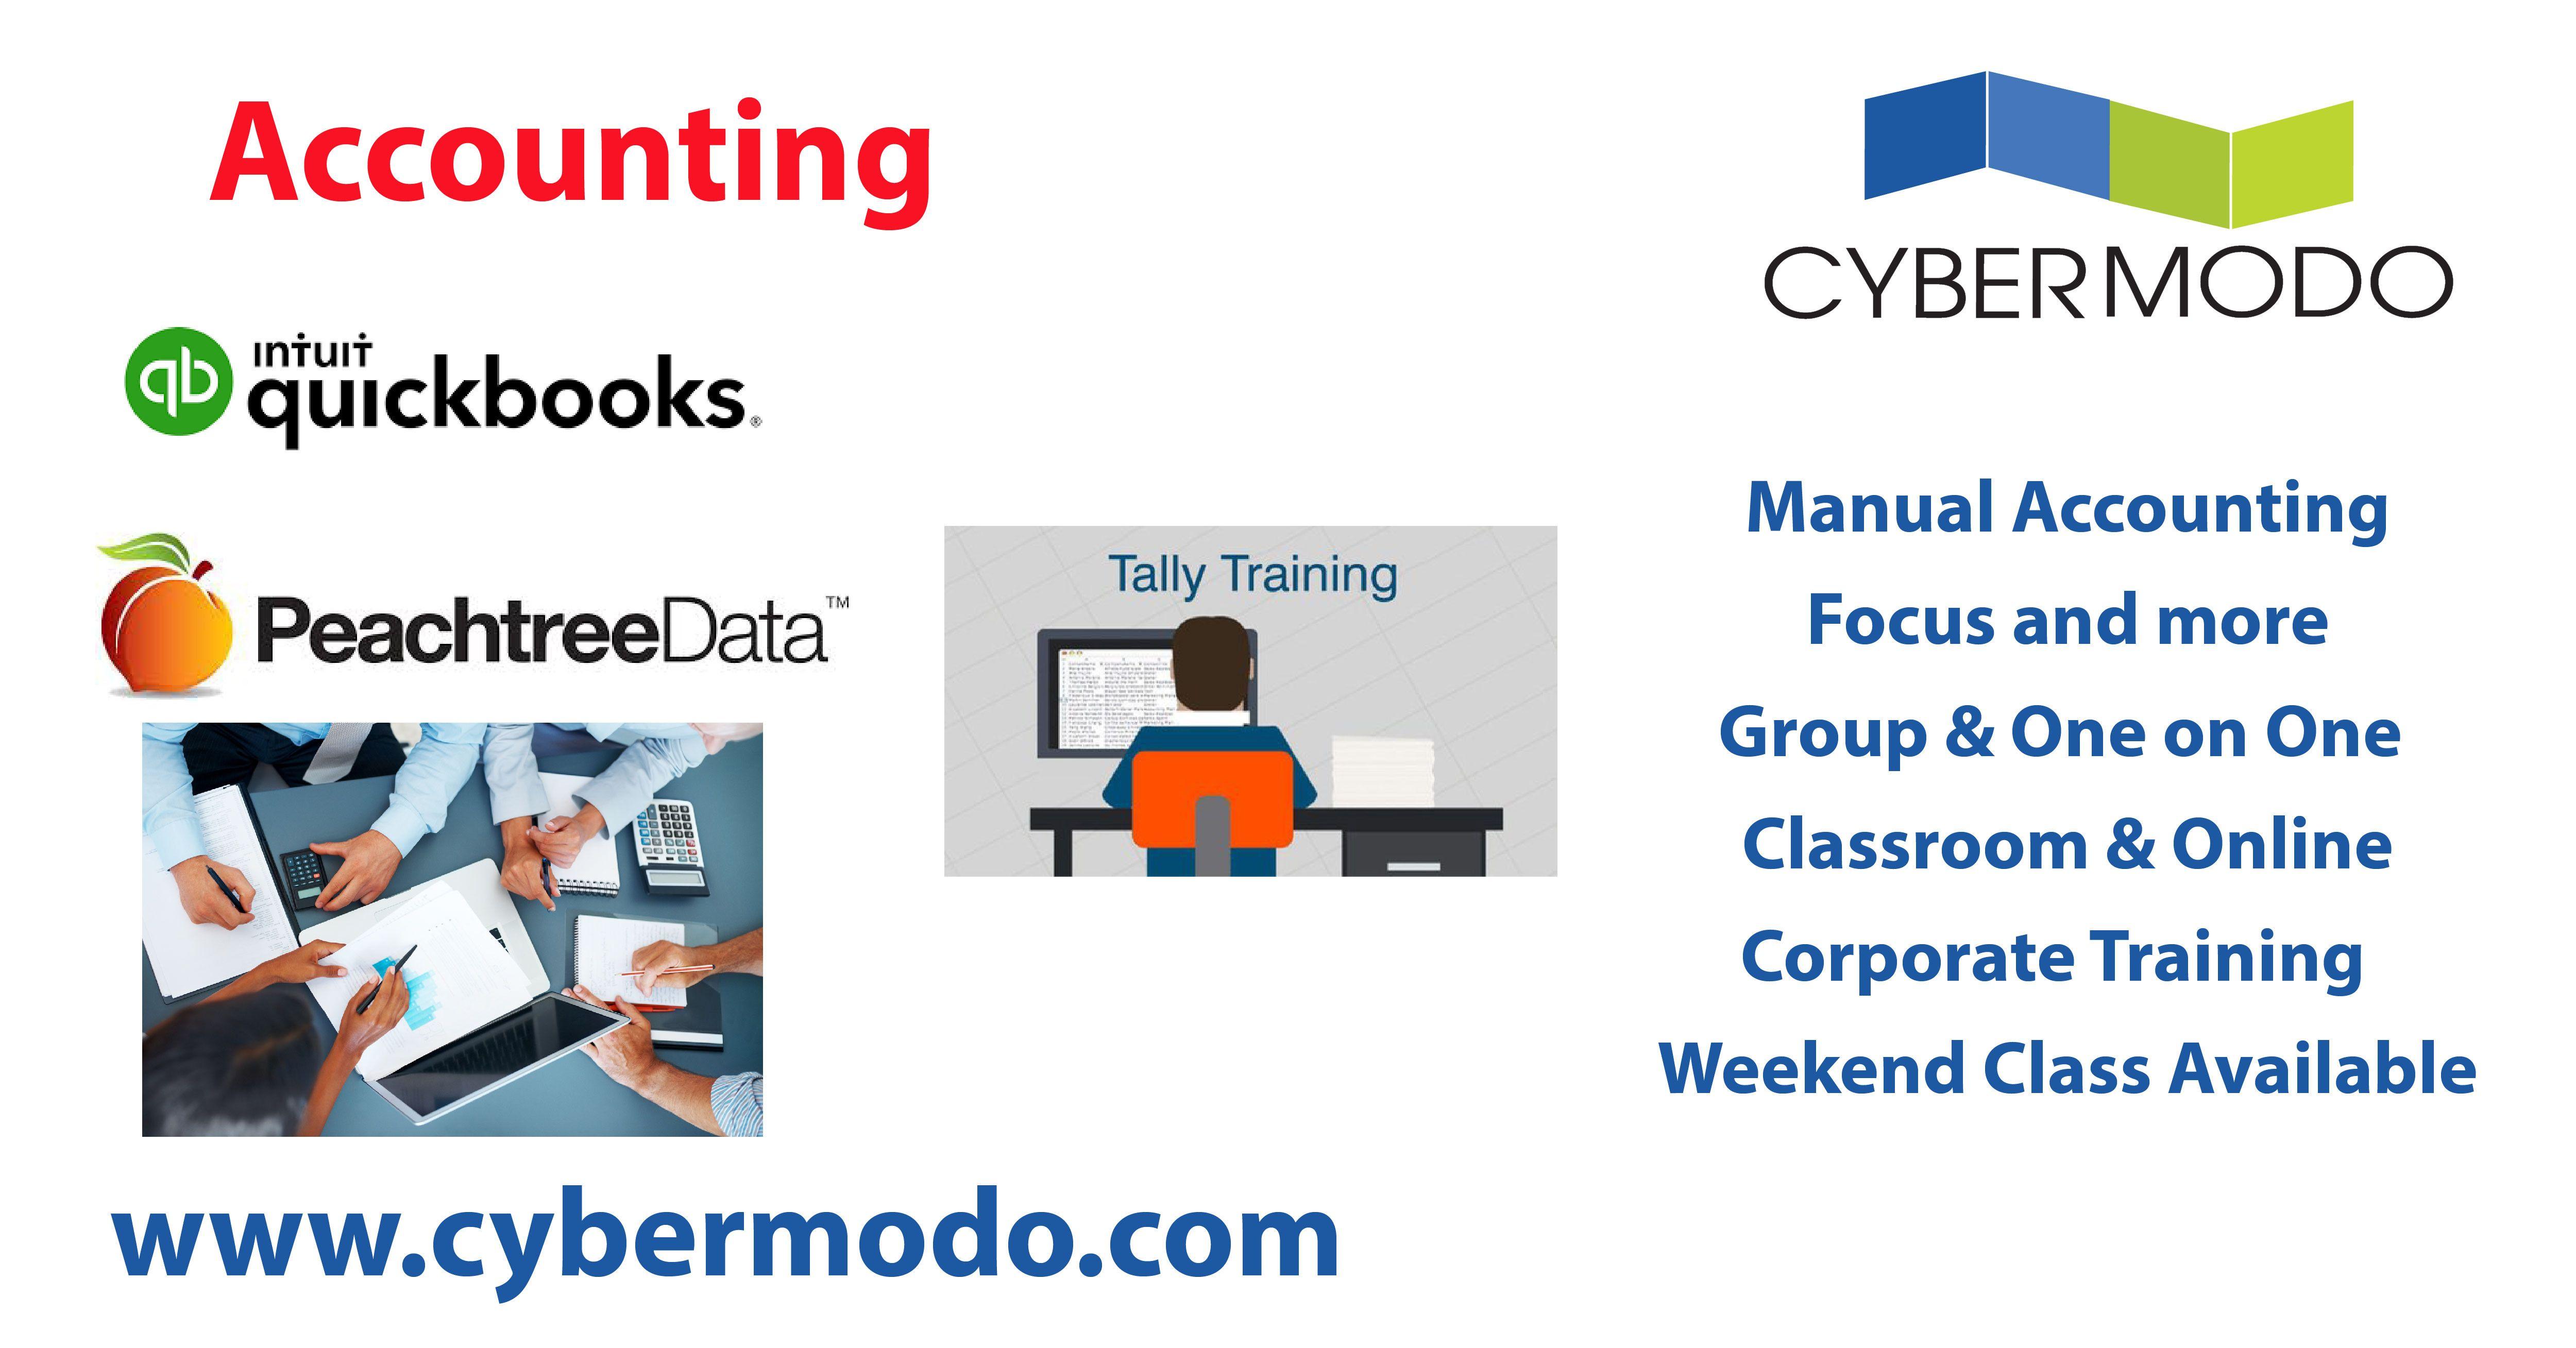 Cyber Modo Solutions 15